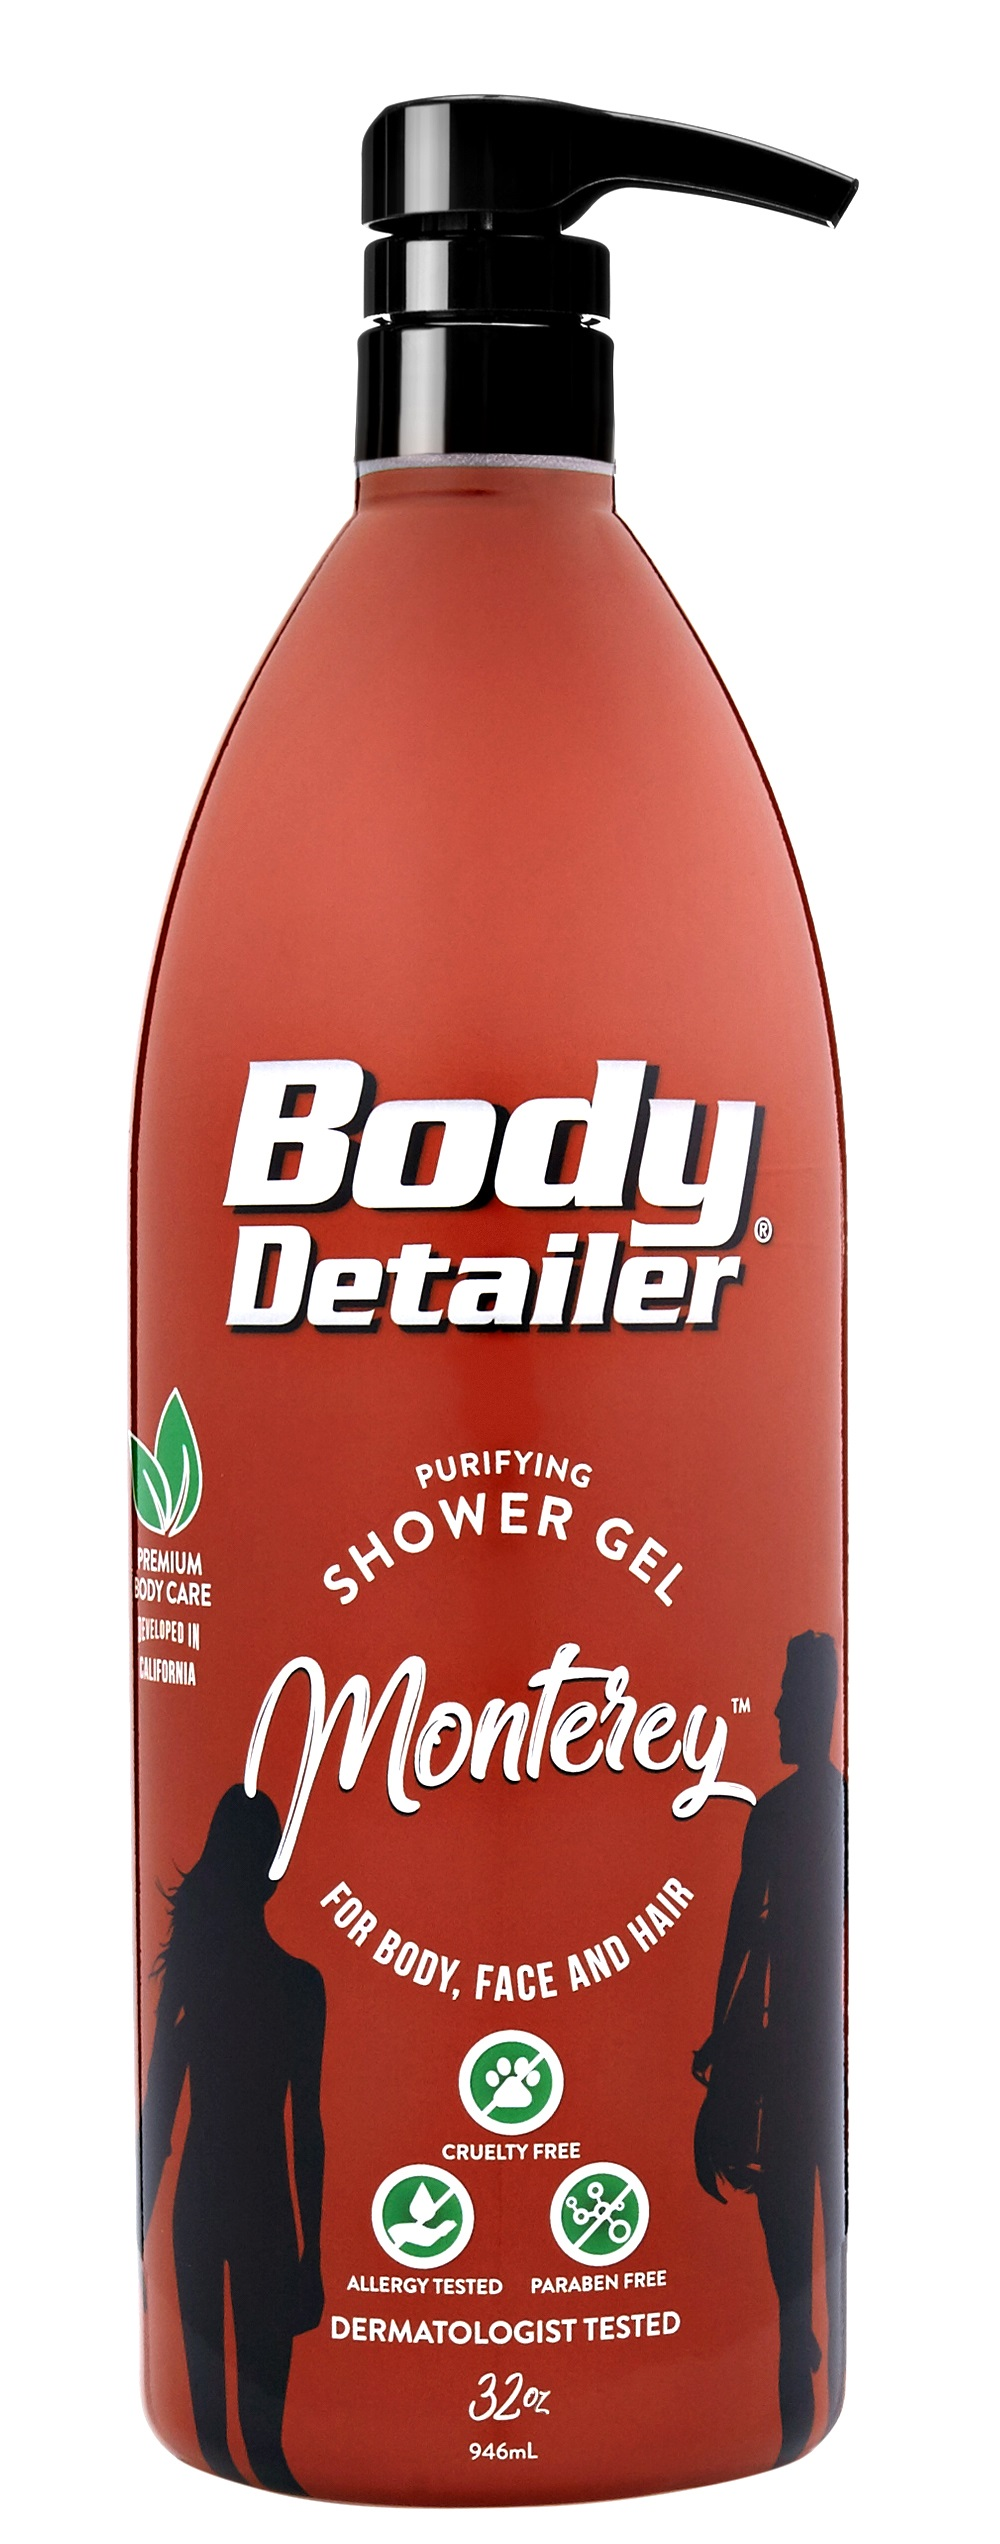 Monterey Moisturizing All In One Shower Gel Shampoo Body Wash 32 oz Pump